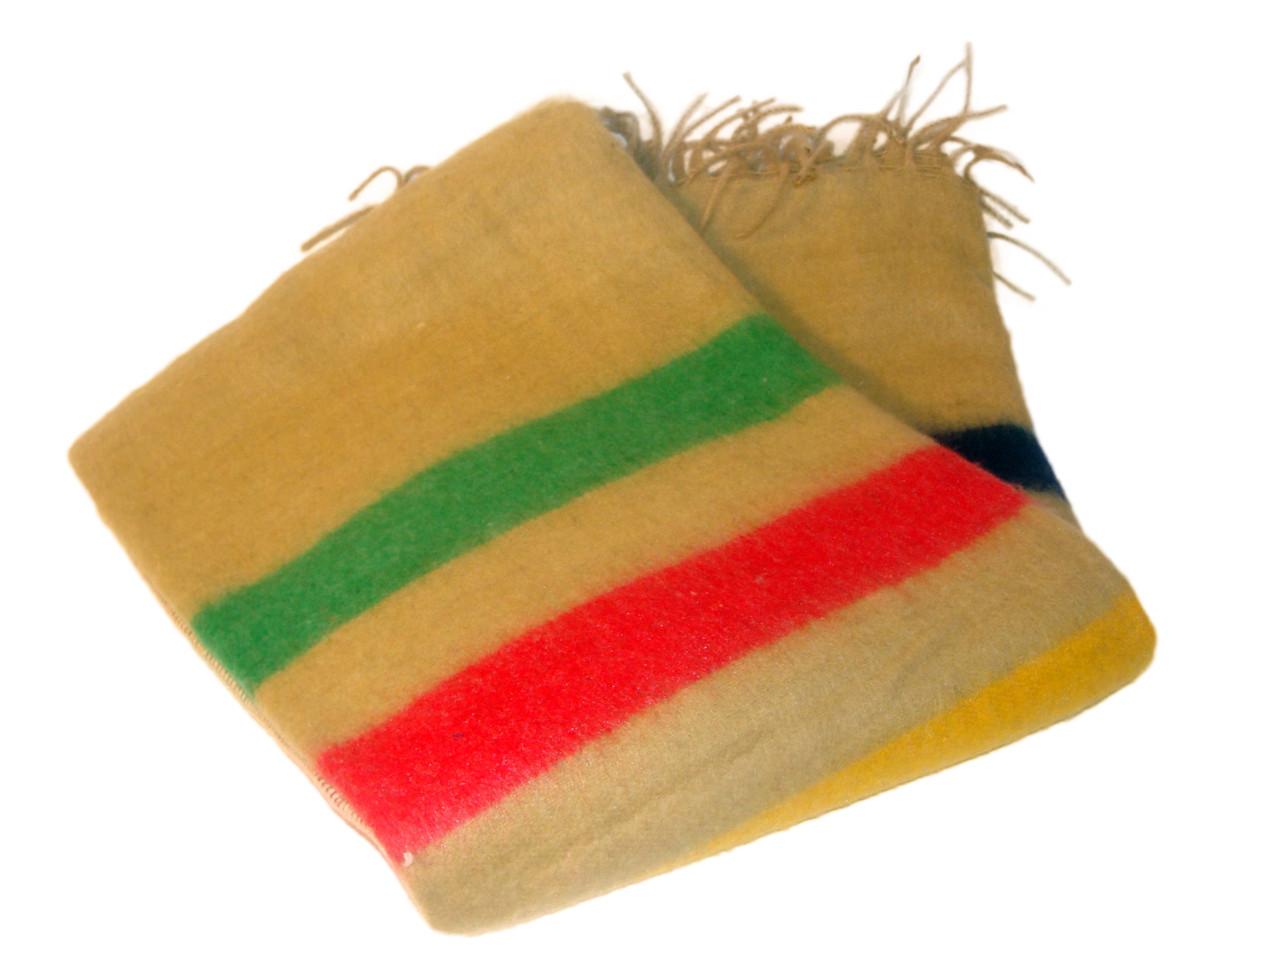 Splendent Alpaca Brushed Northwest Striped Hudson Bay Blanket Brushed Alpaca Blanket Hudson Bay Style Striped Fringed Sanyork Hudson Bay Blanket Bedroom Hudson Bay Blanket Made England houzz-03 Hudson Bay Blanket